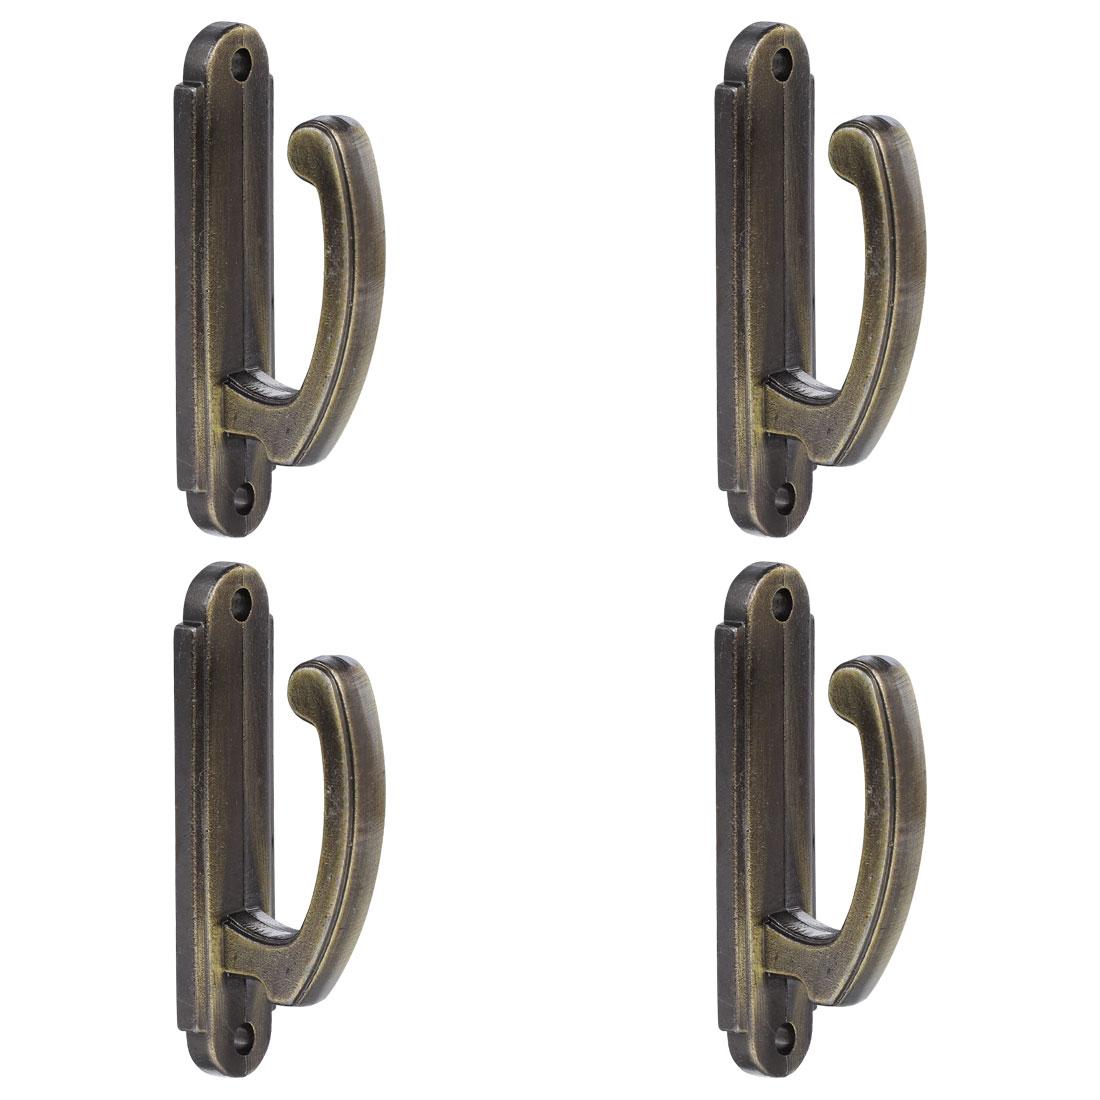 Curtain Tieback Hook, Zinc Alloy Drapery Holdback Screen Hooks 4pcs Bronze Tone